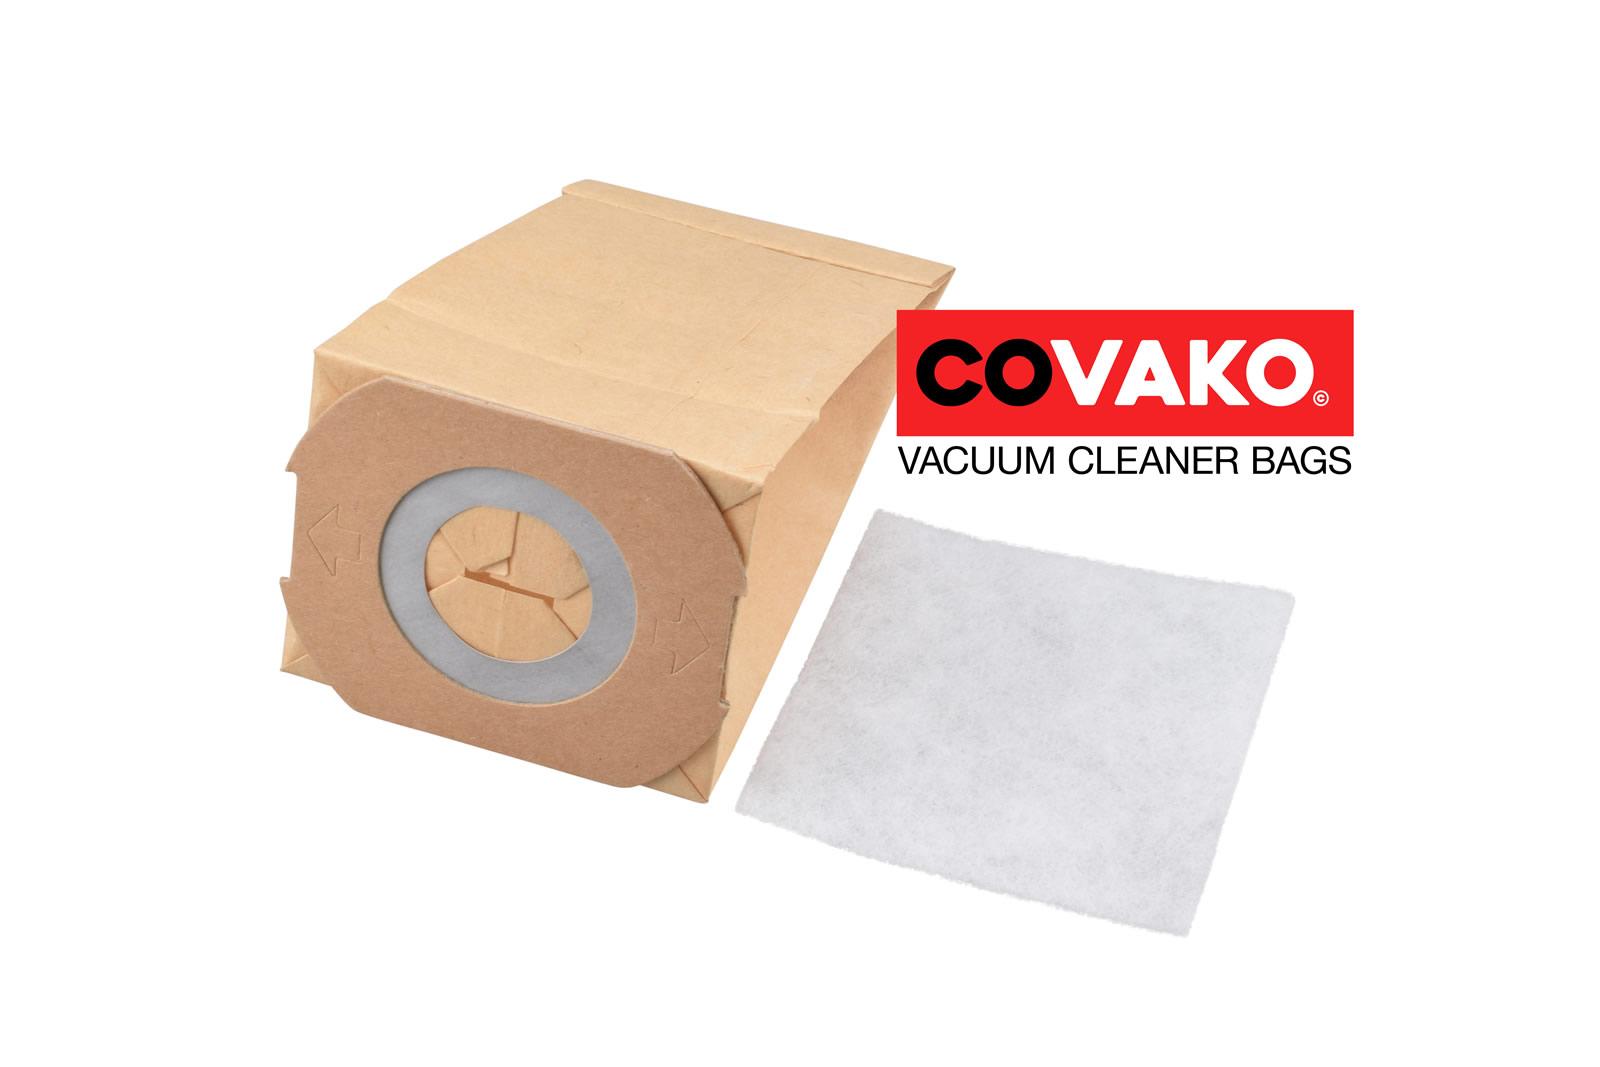 Omega Contur HSS 09/3 / Paper - Omega vacuum cleaner bags